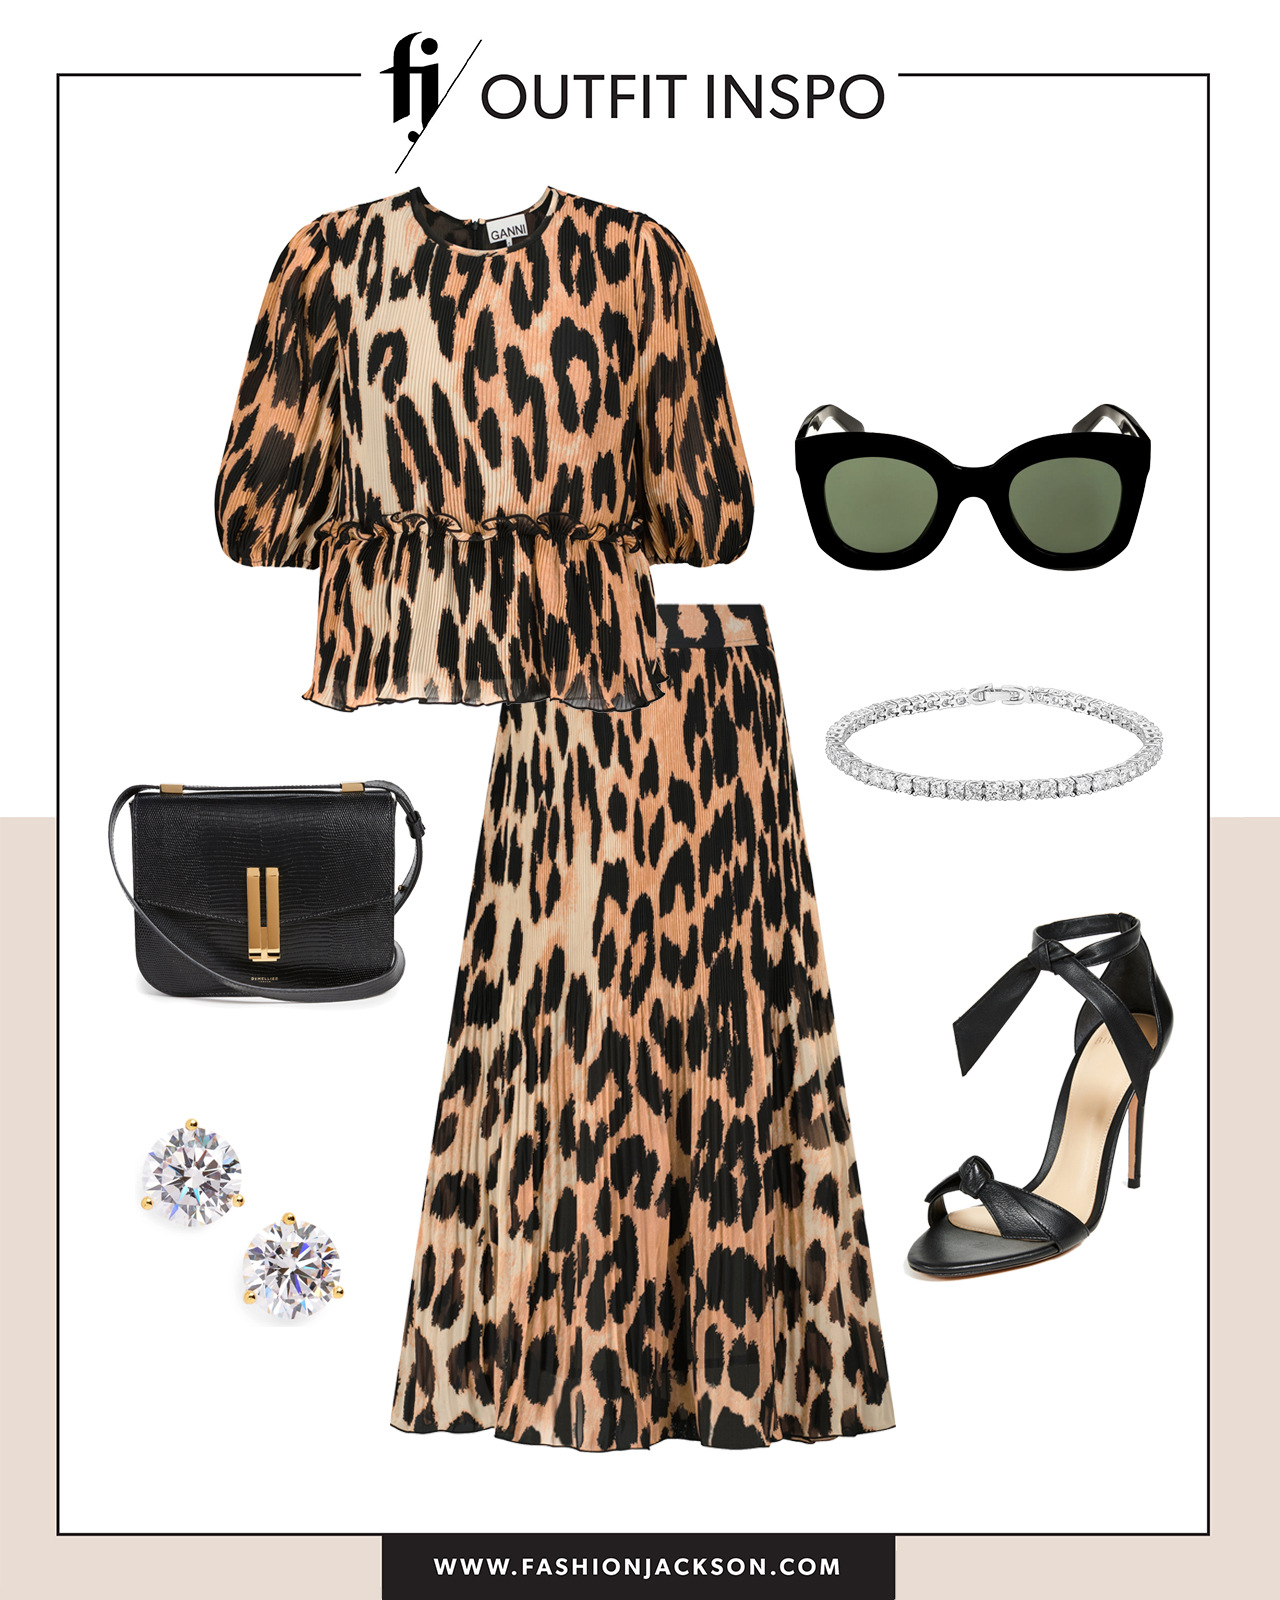 leopard top outfit inspo